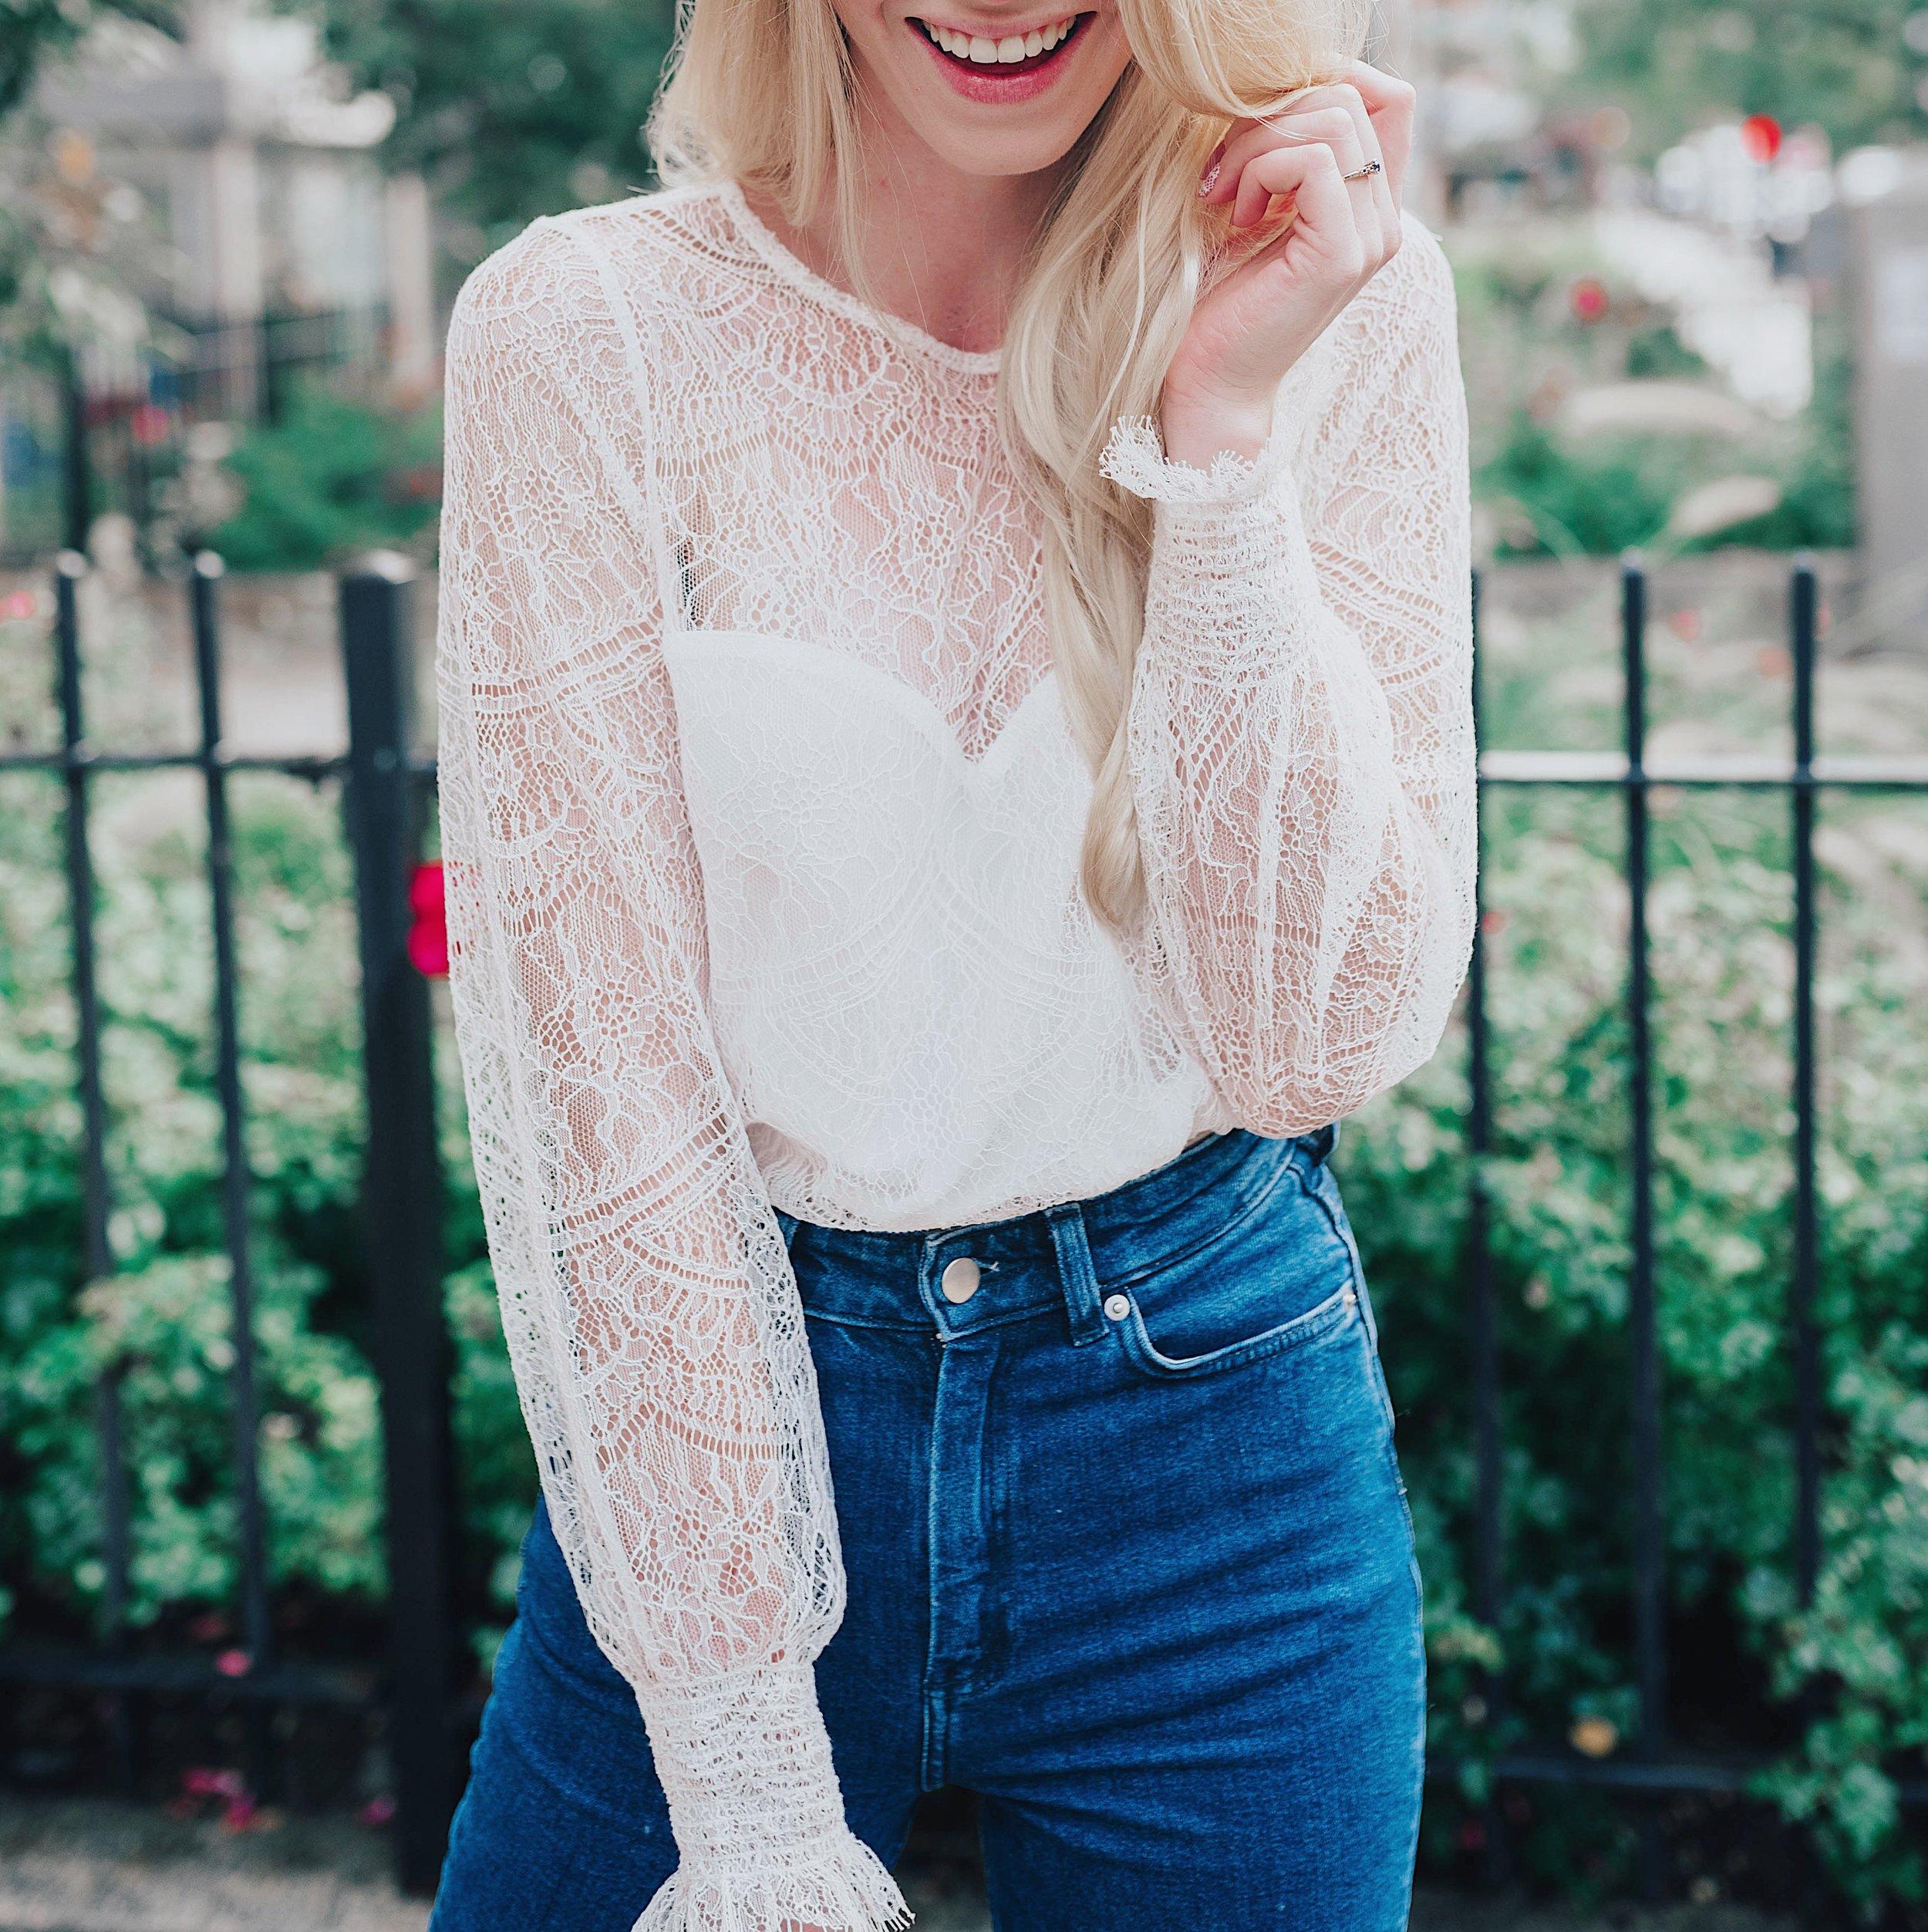 Blogger White Jenevra Lace Top (@maevestier)